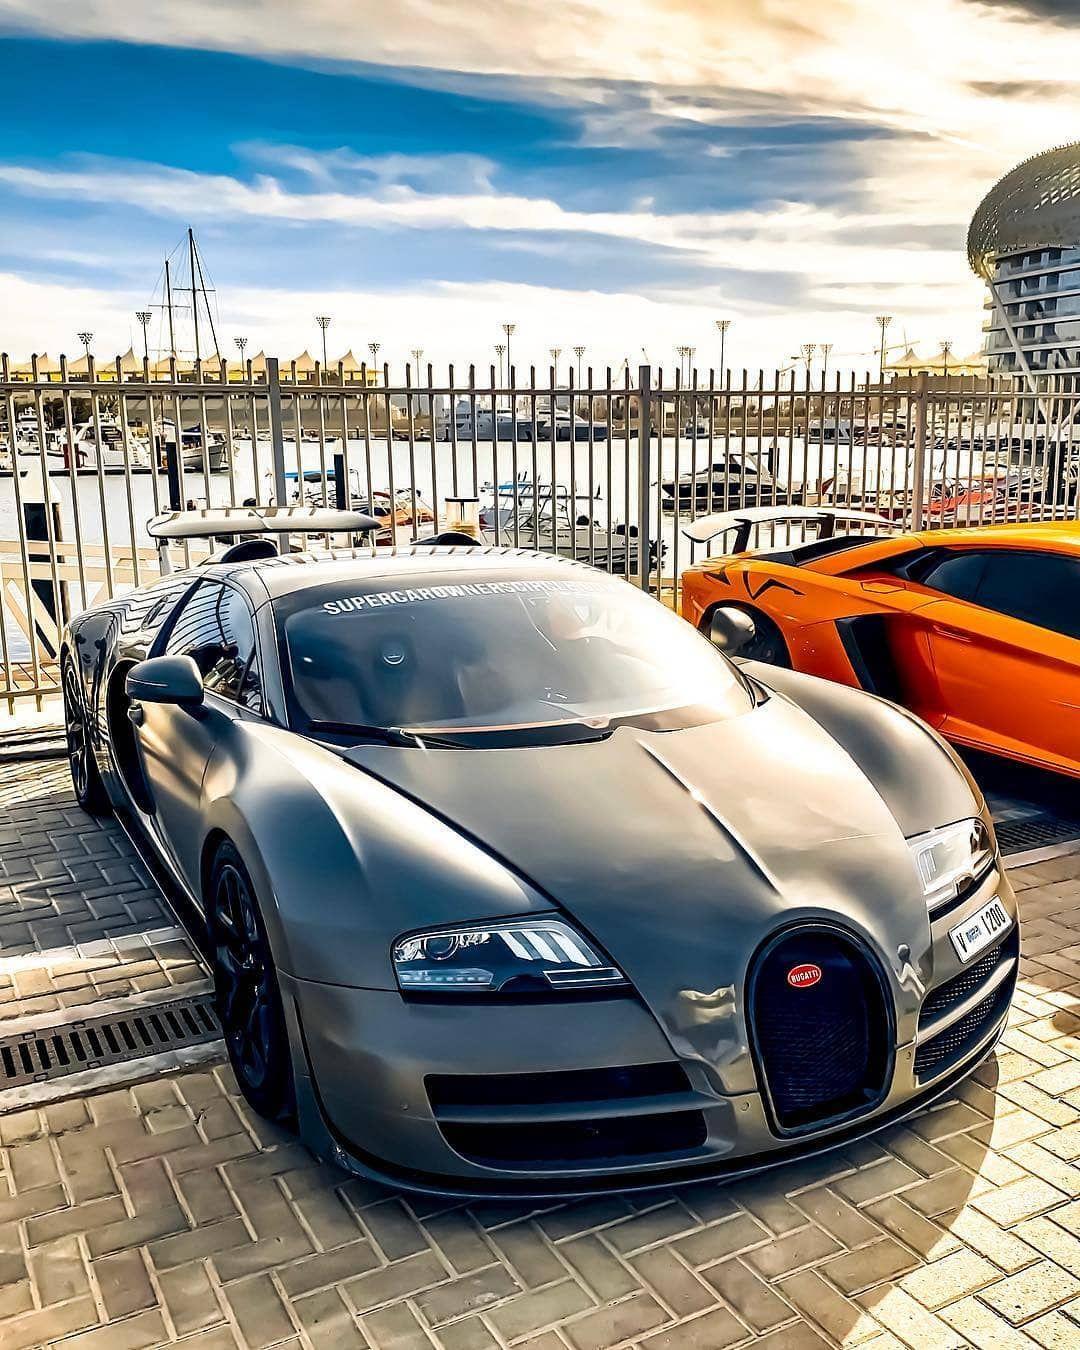 Rate This Veyron Photo By K Cars Bugatti Car Cars Lamborgini Supercars Instacars Carpic Automobile Superc K Car Bugatti Bugatti Veyron Vitesse